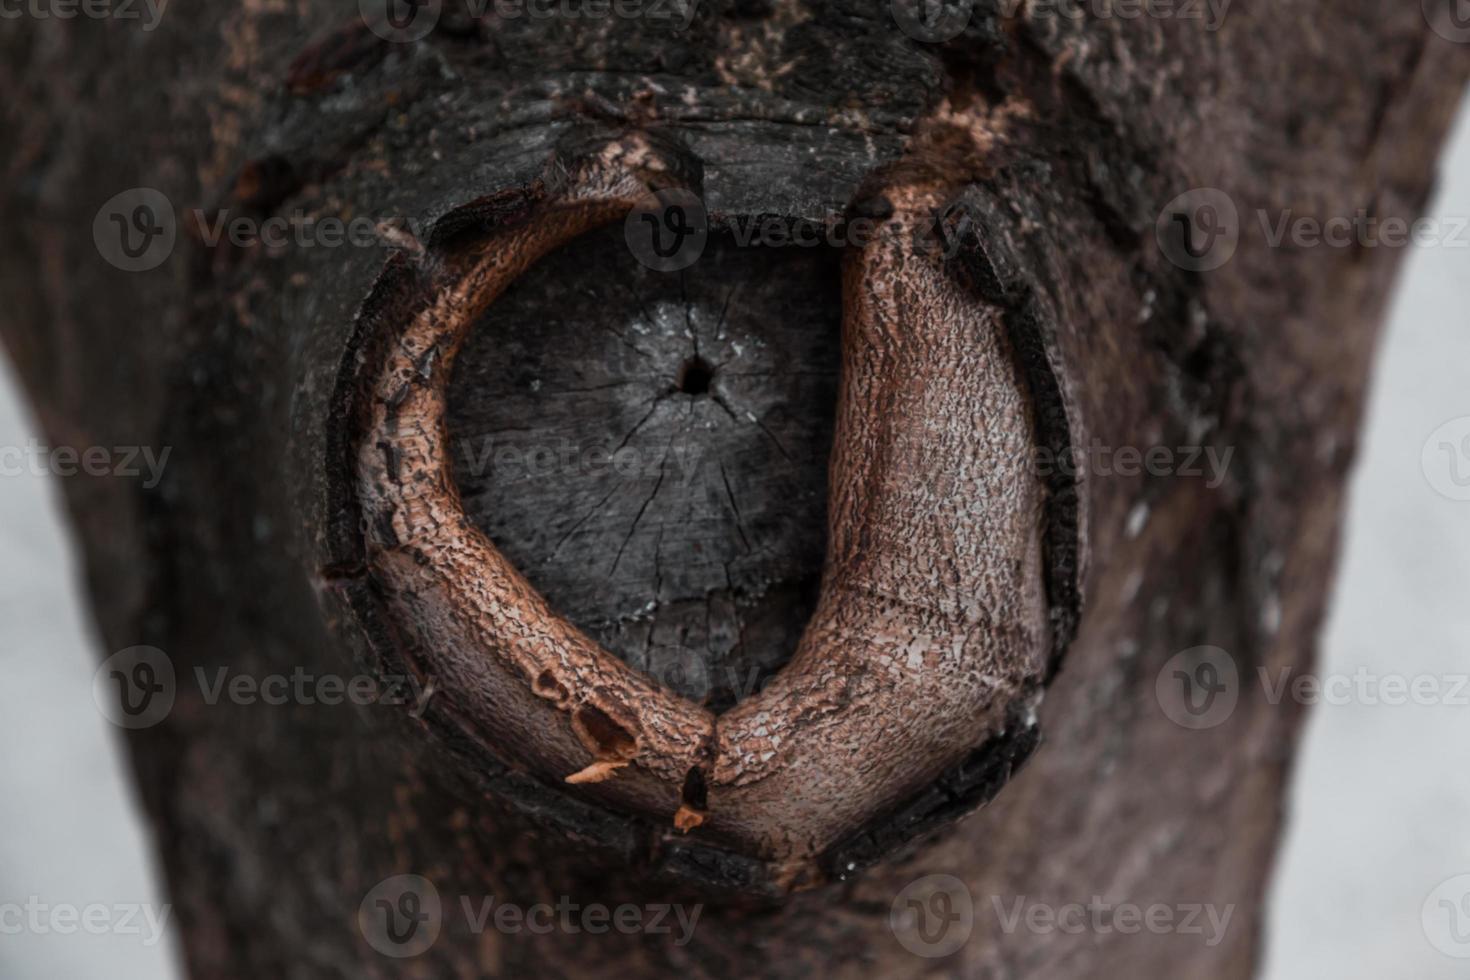 textura de corteza de árbol con un nudo circular foto